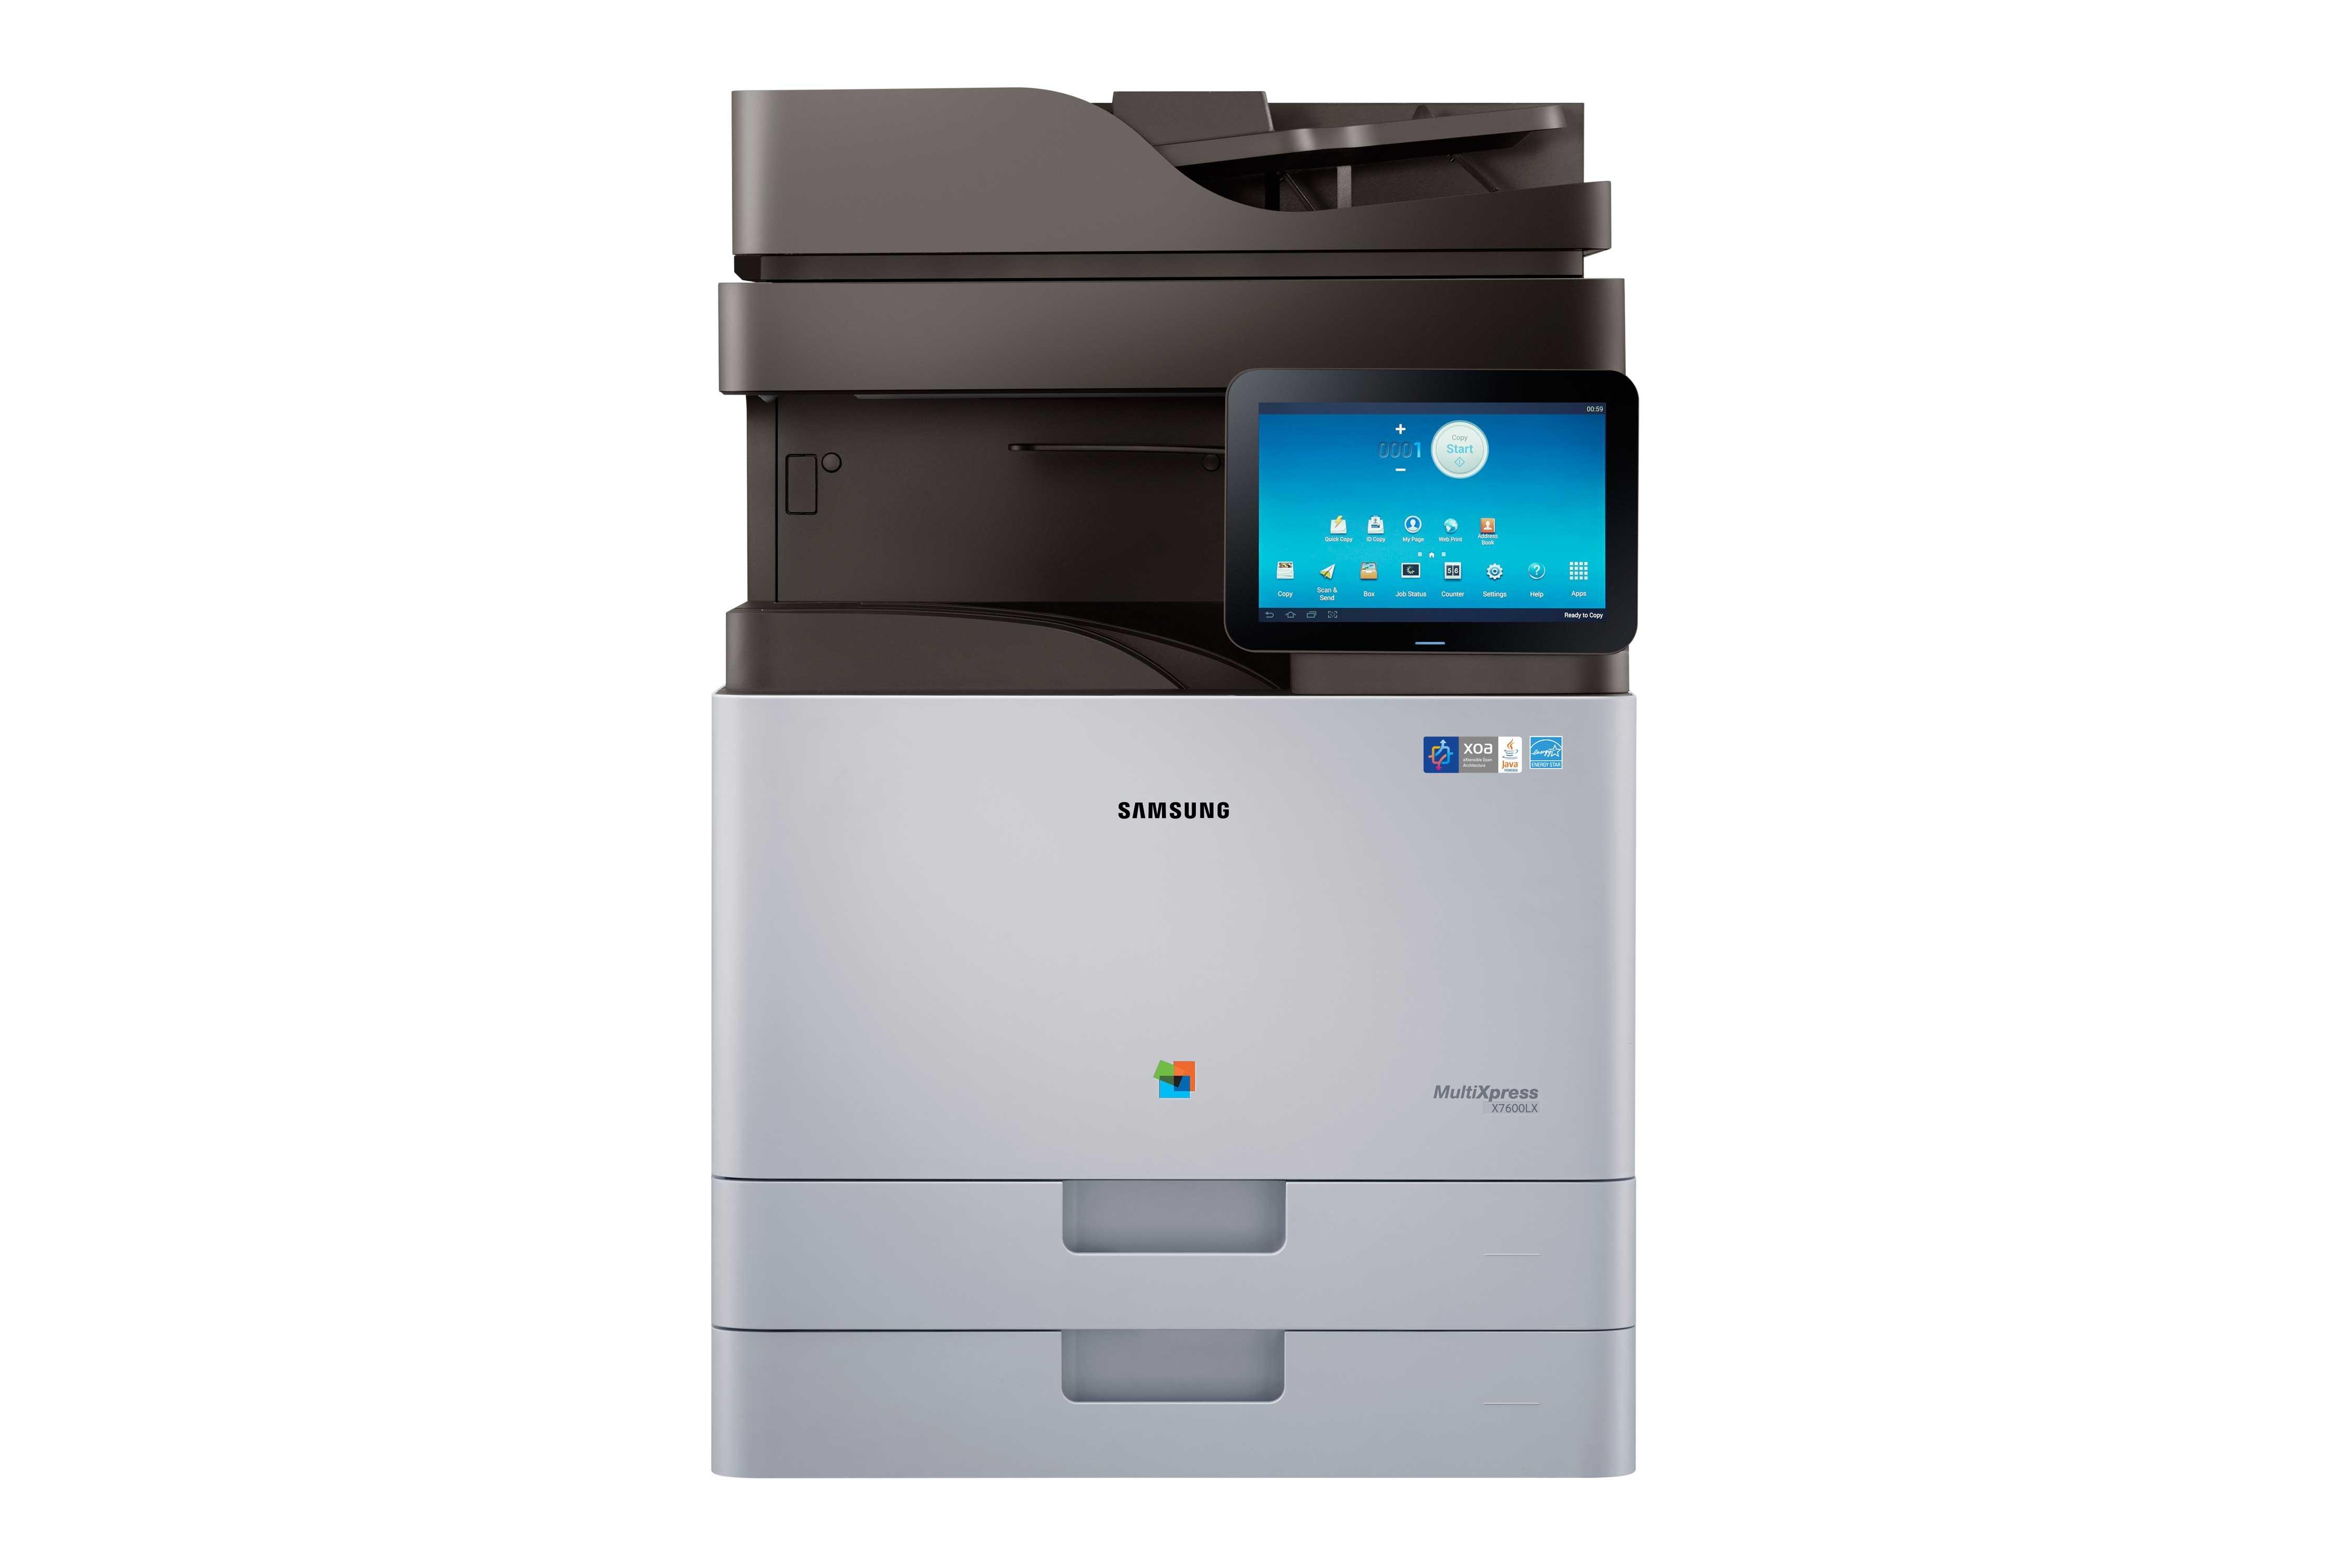 Samsung X7600 Image.jpg